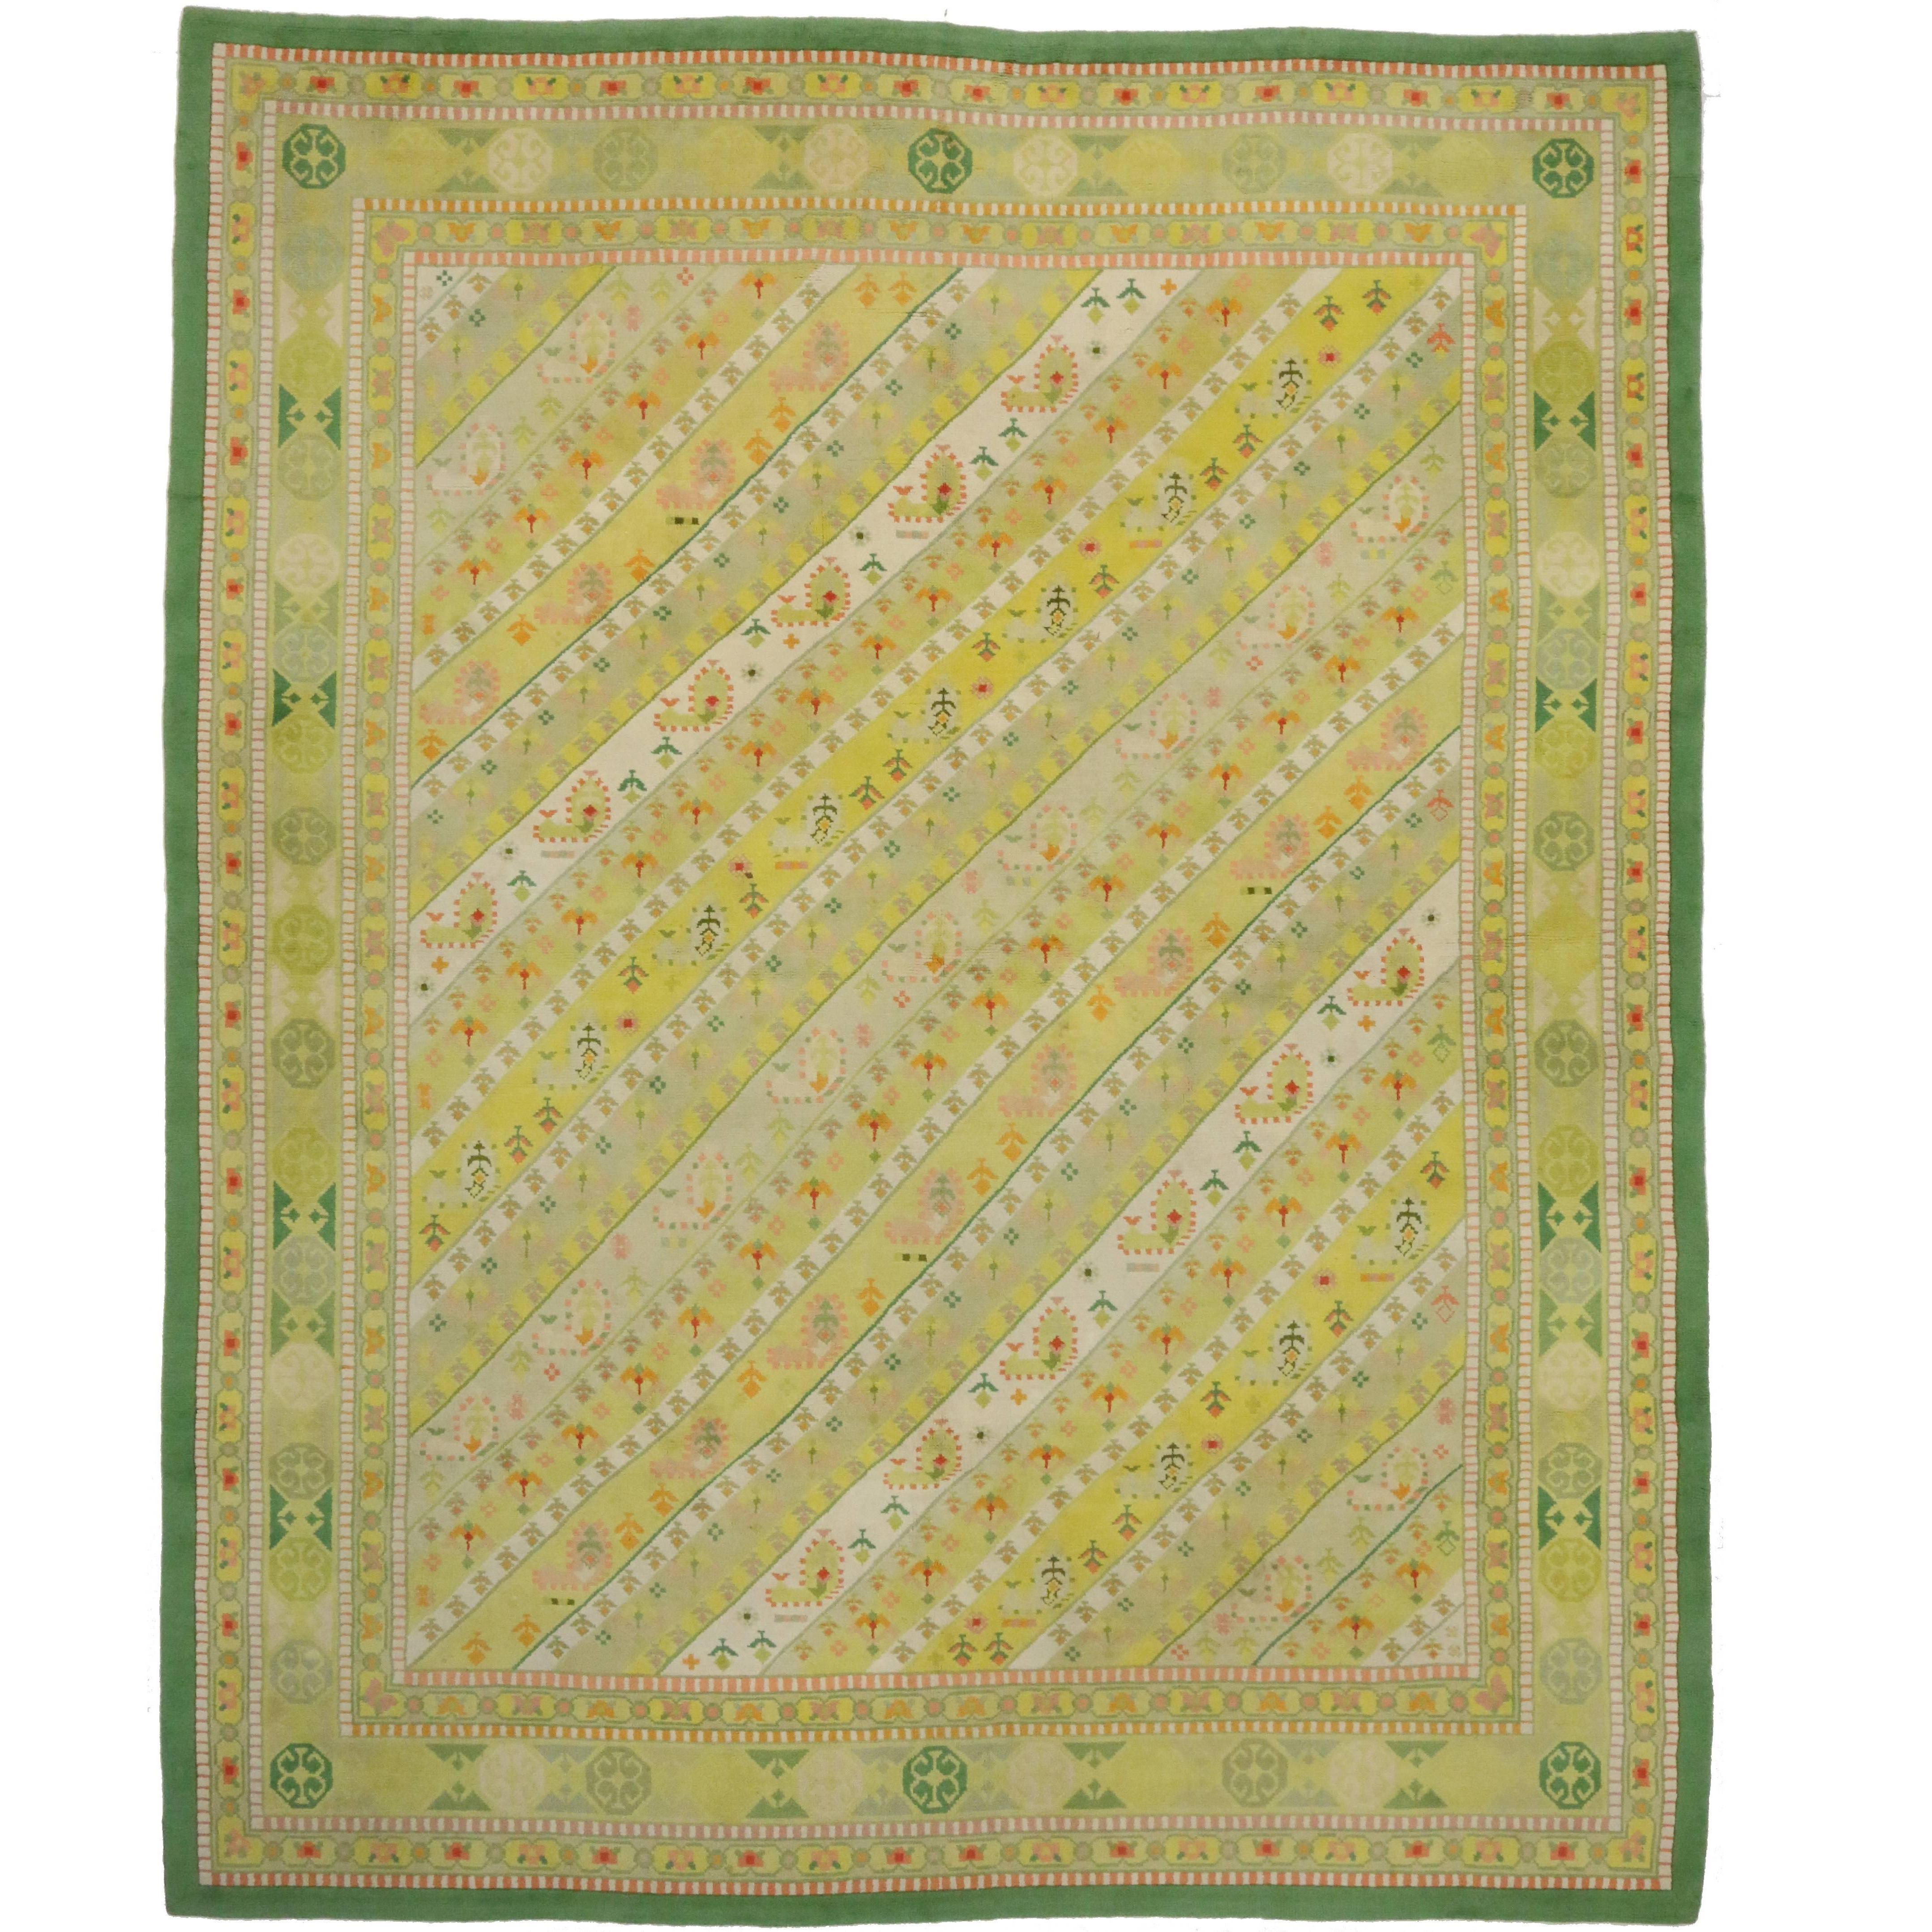 Vintage Spanish Carpet with Striped Muharramat Design, Neoclassic Art Deco Style